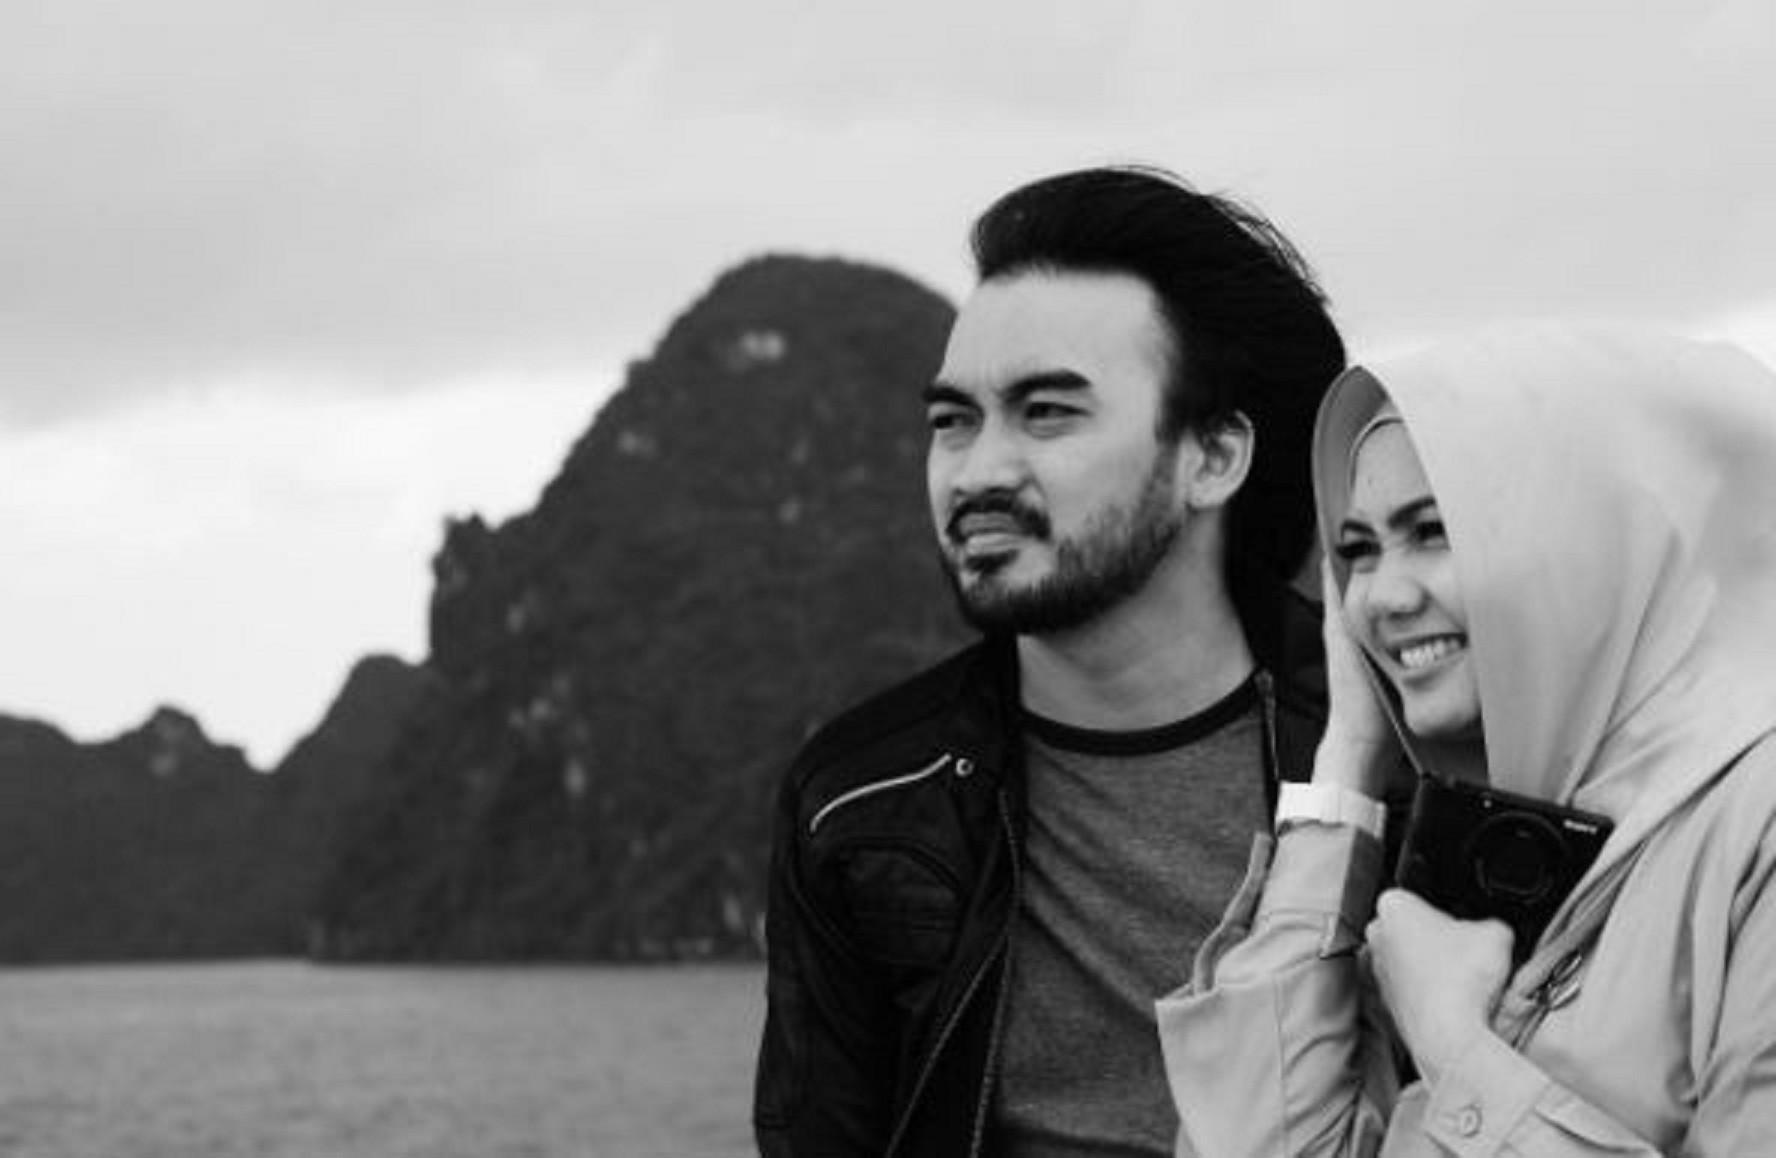 Rina Nose bersama mantan suaminya, Ridwan Federani Anwar (Instagram/@rinanose16)